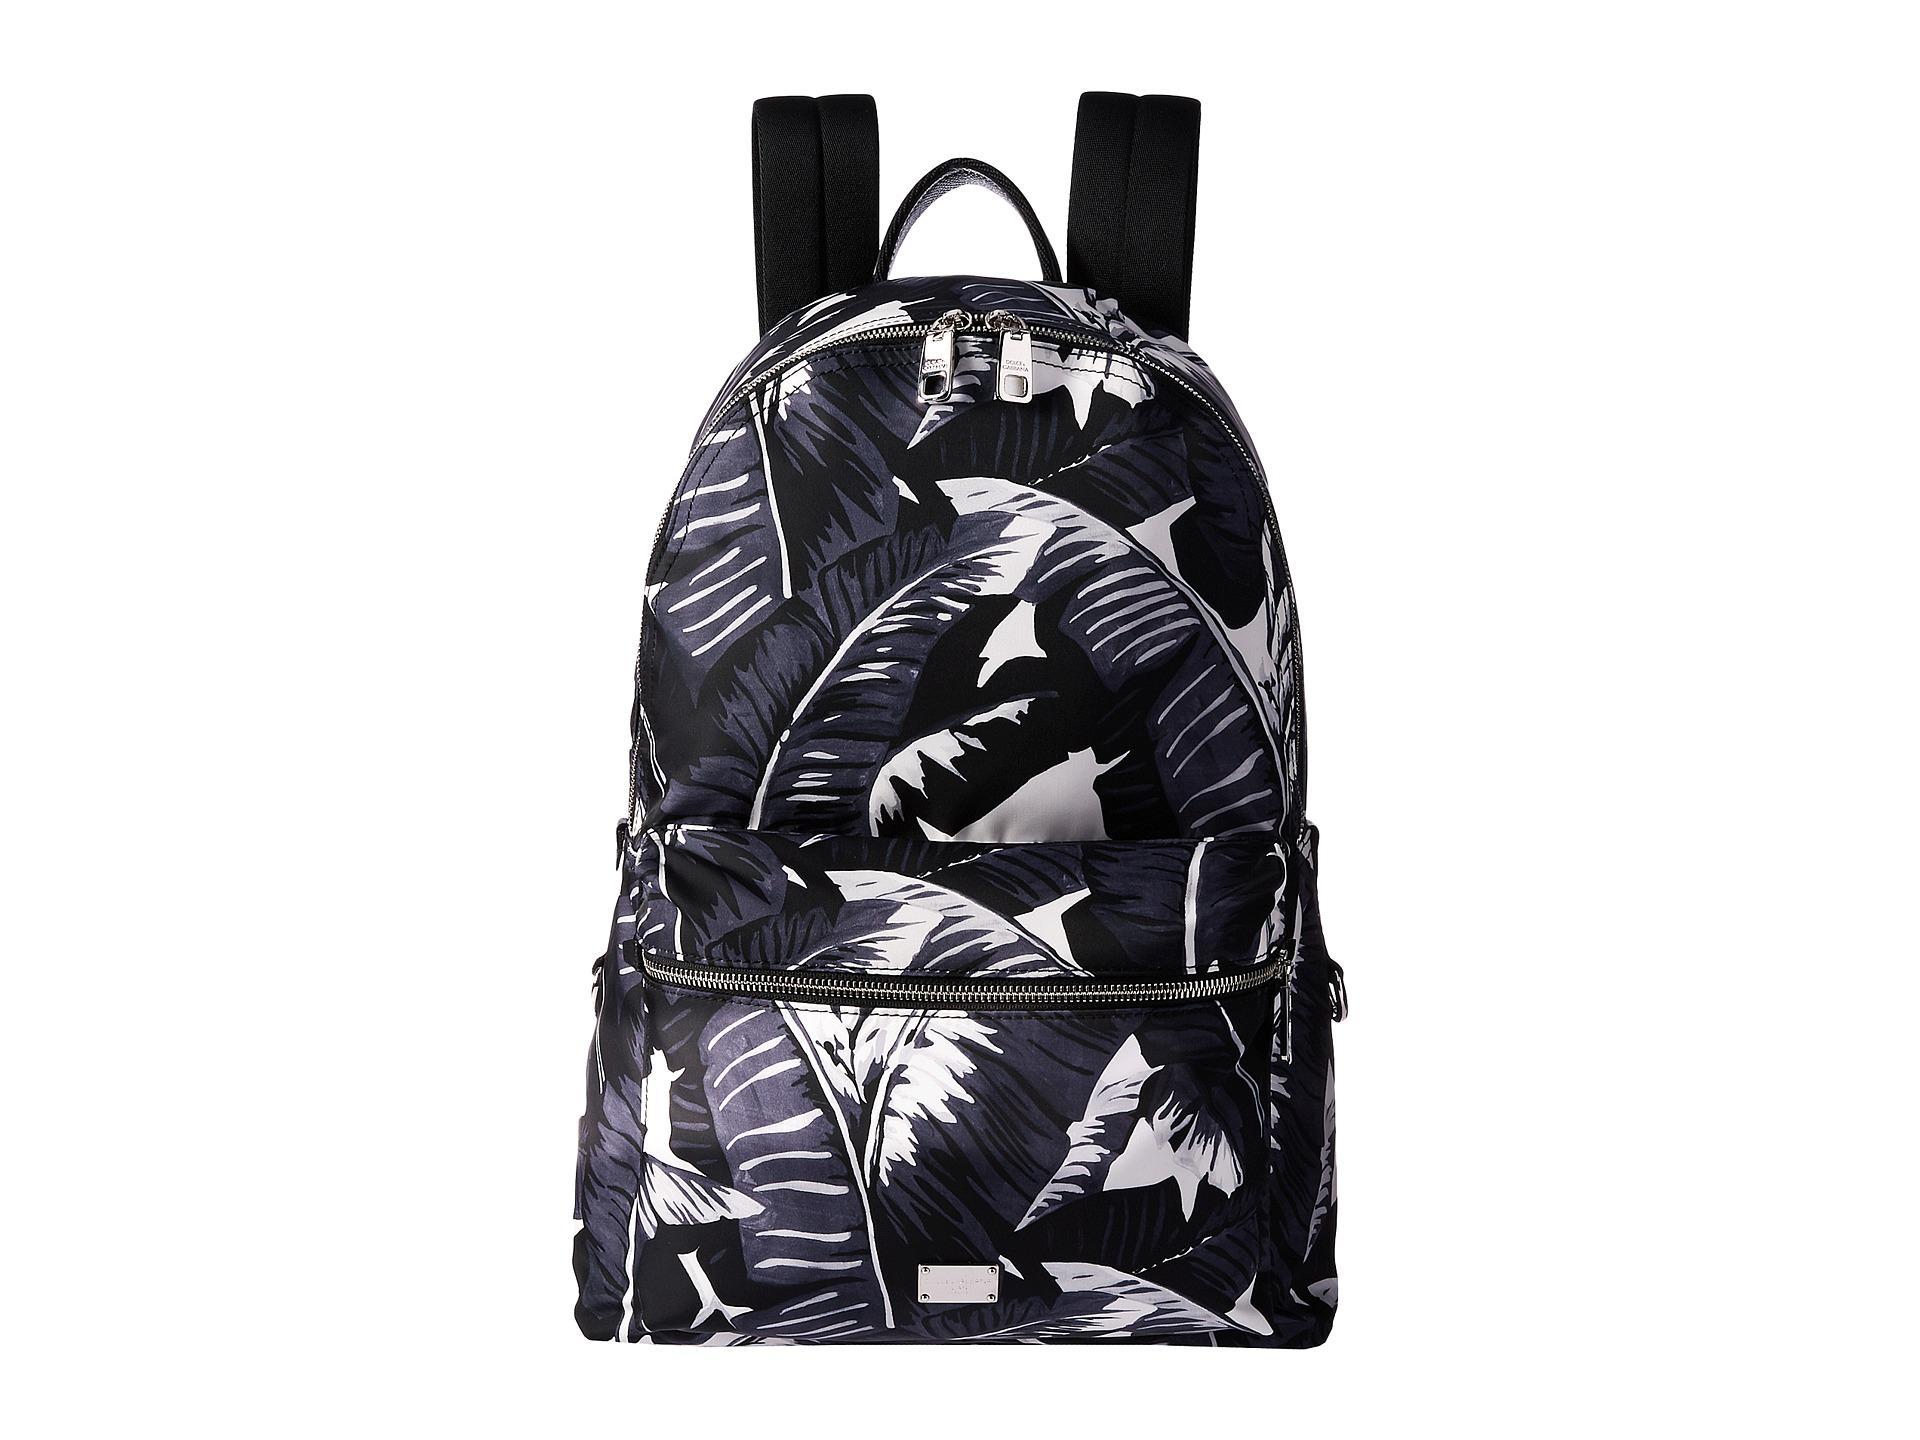 988d1243dd2 Lyst - Dolce   Gabbana Banana Leaf Printed Nylon Backpack in Black ...